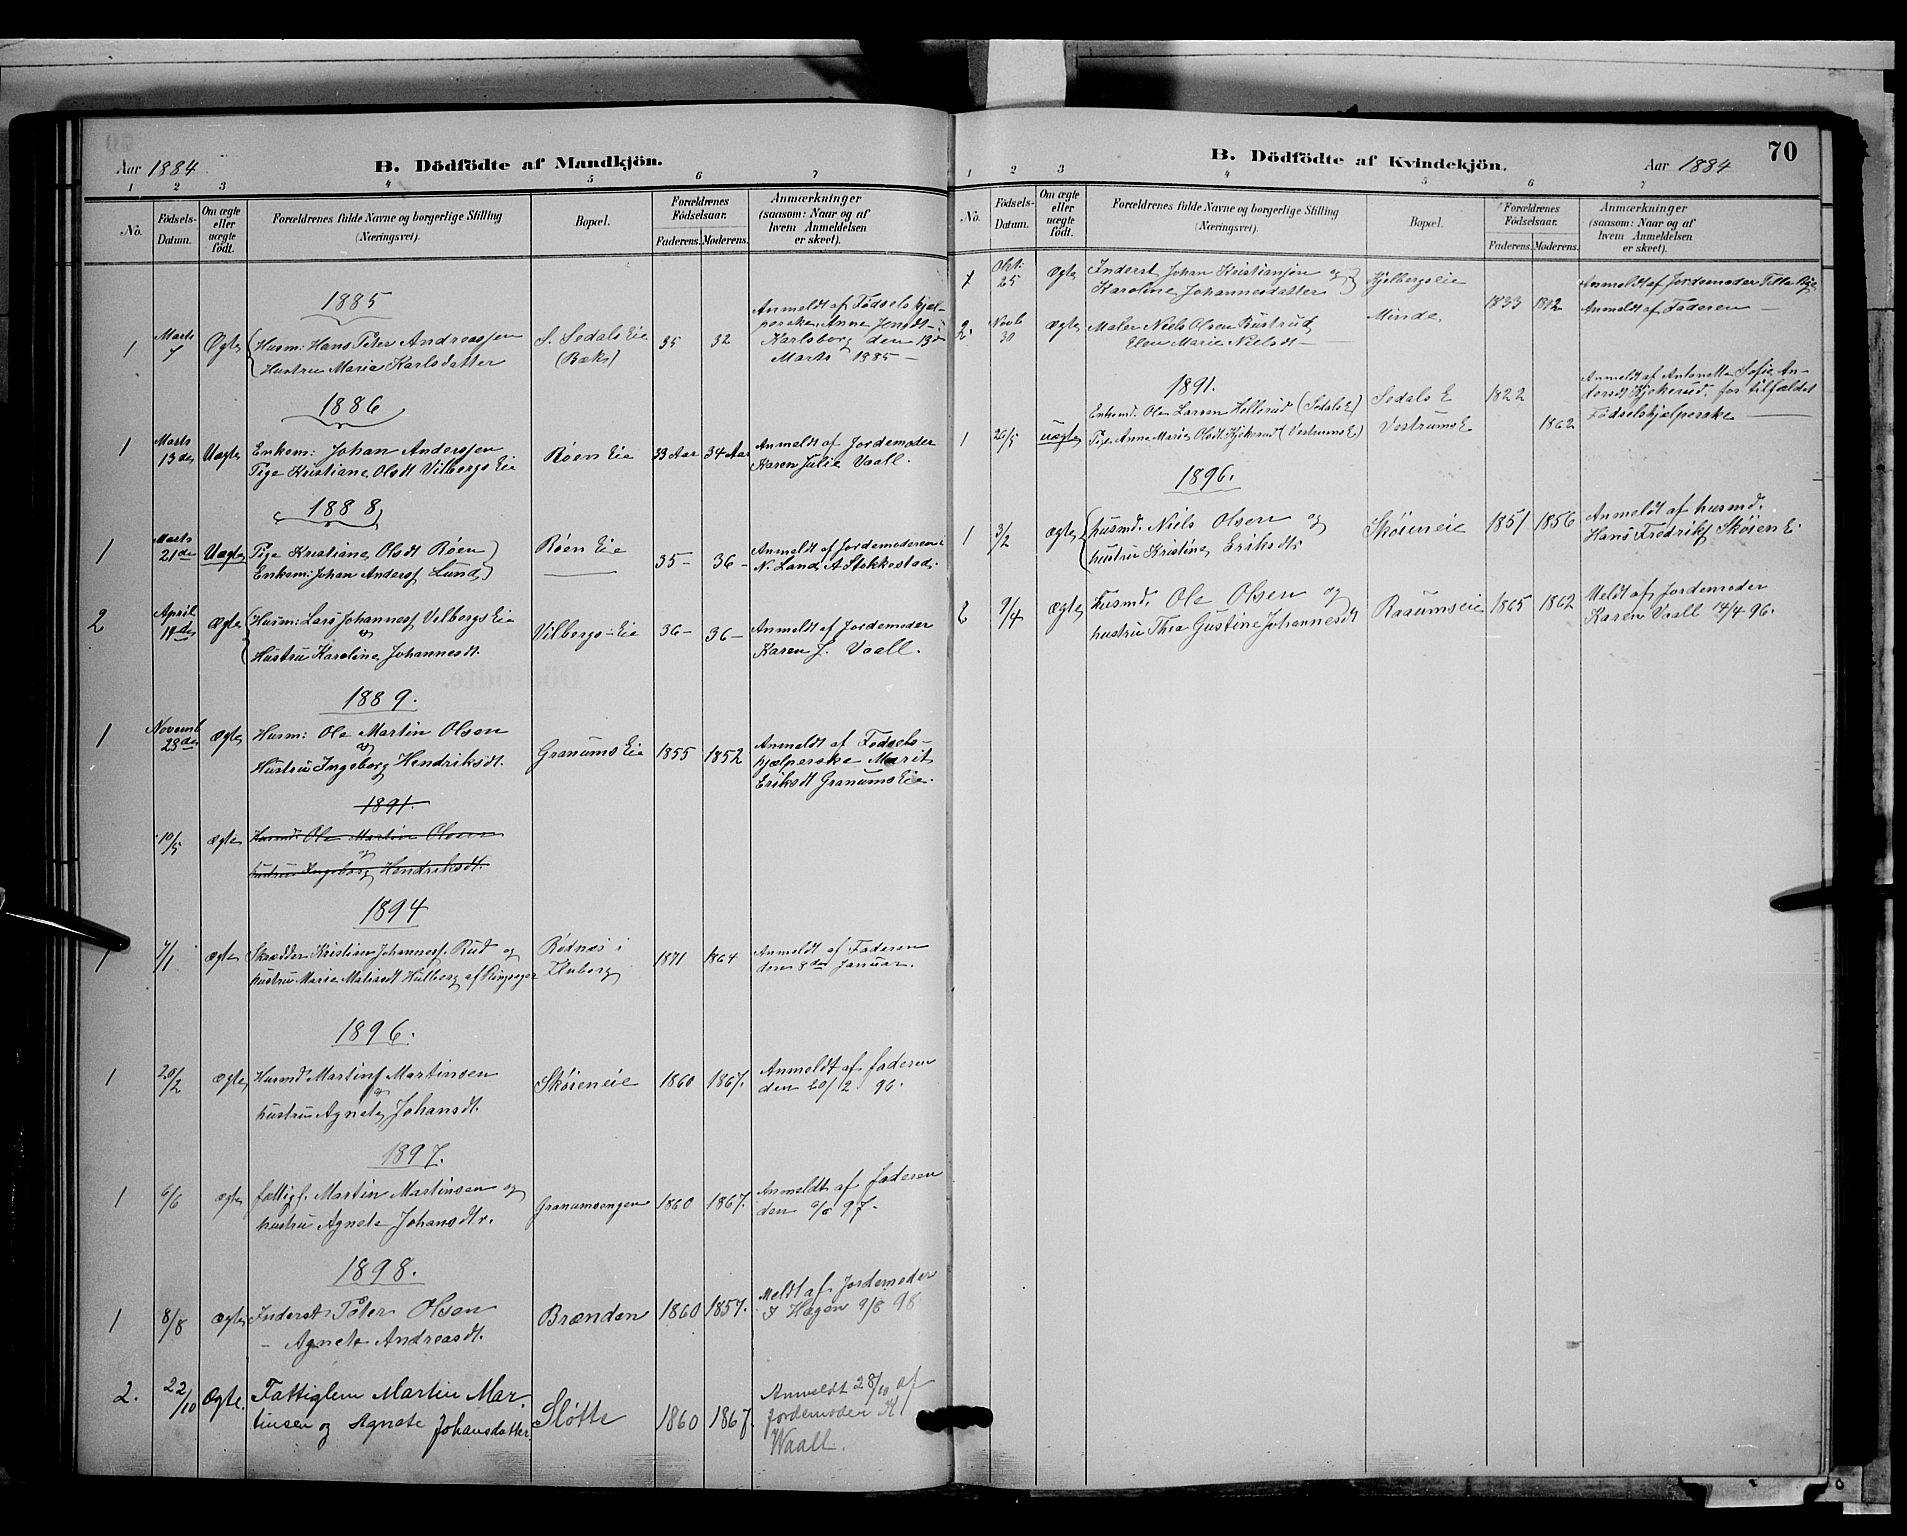 SAH, Søndre Land prestekontor, L/L0003: Klokkerbok nr. 3, 1884-1902, s. 70